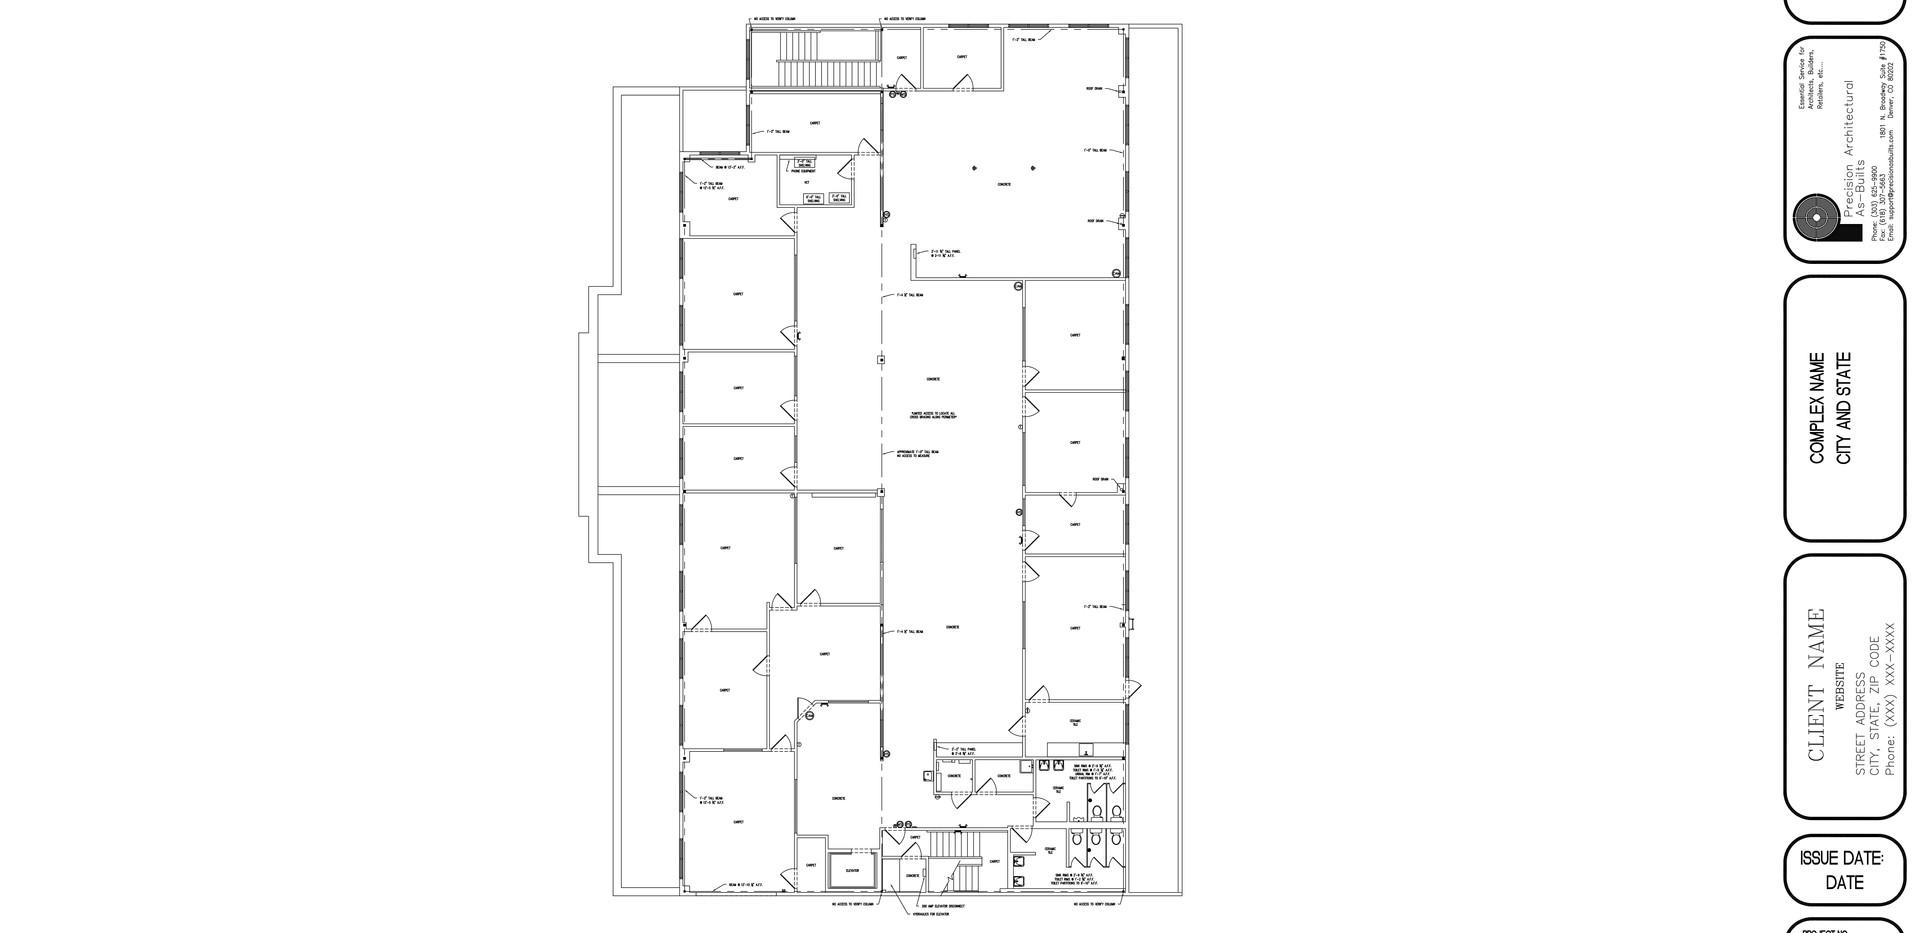 Upper Level Floor Plan A1.3